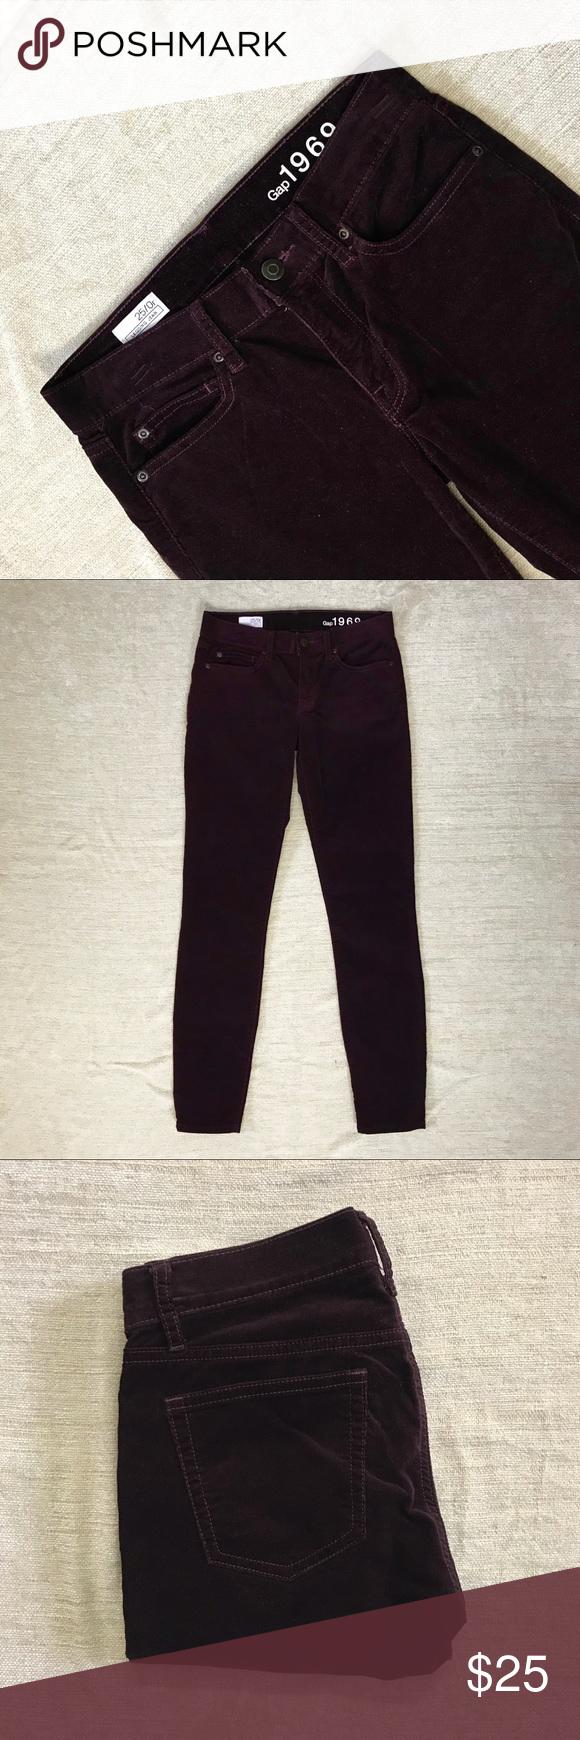 Gap Maroon Corduroy Legging Jeans Cotton Rich 4pc Size 25 0r Waist 28 Rise 8 Inseam 29 78 22 Elastane Like New